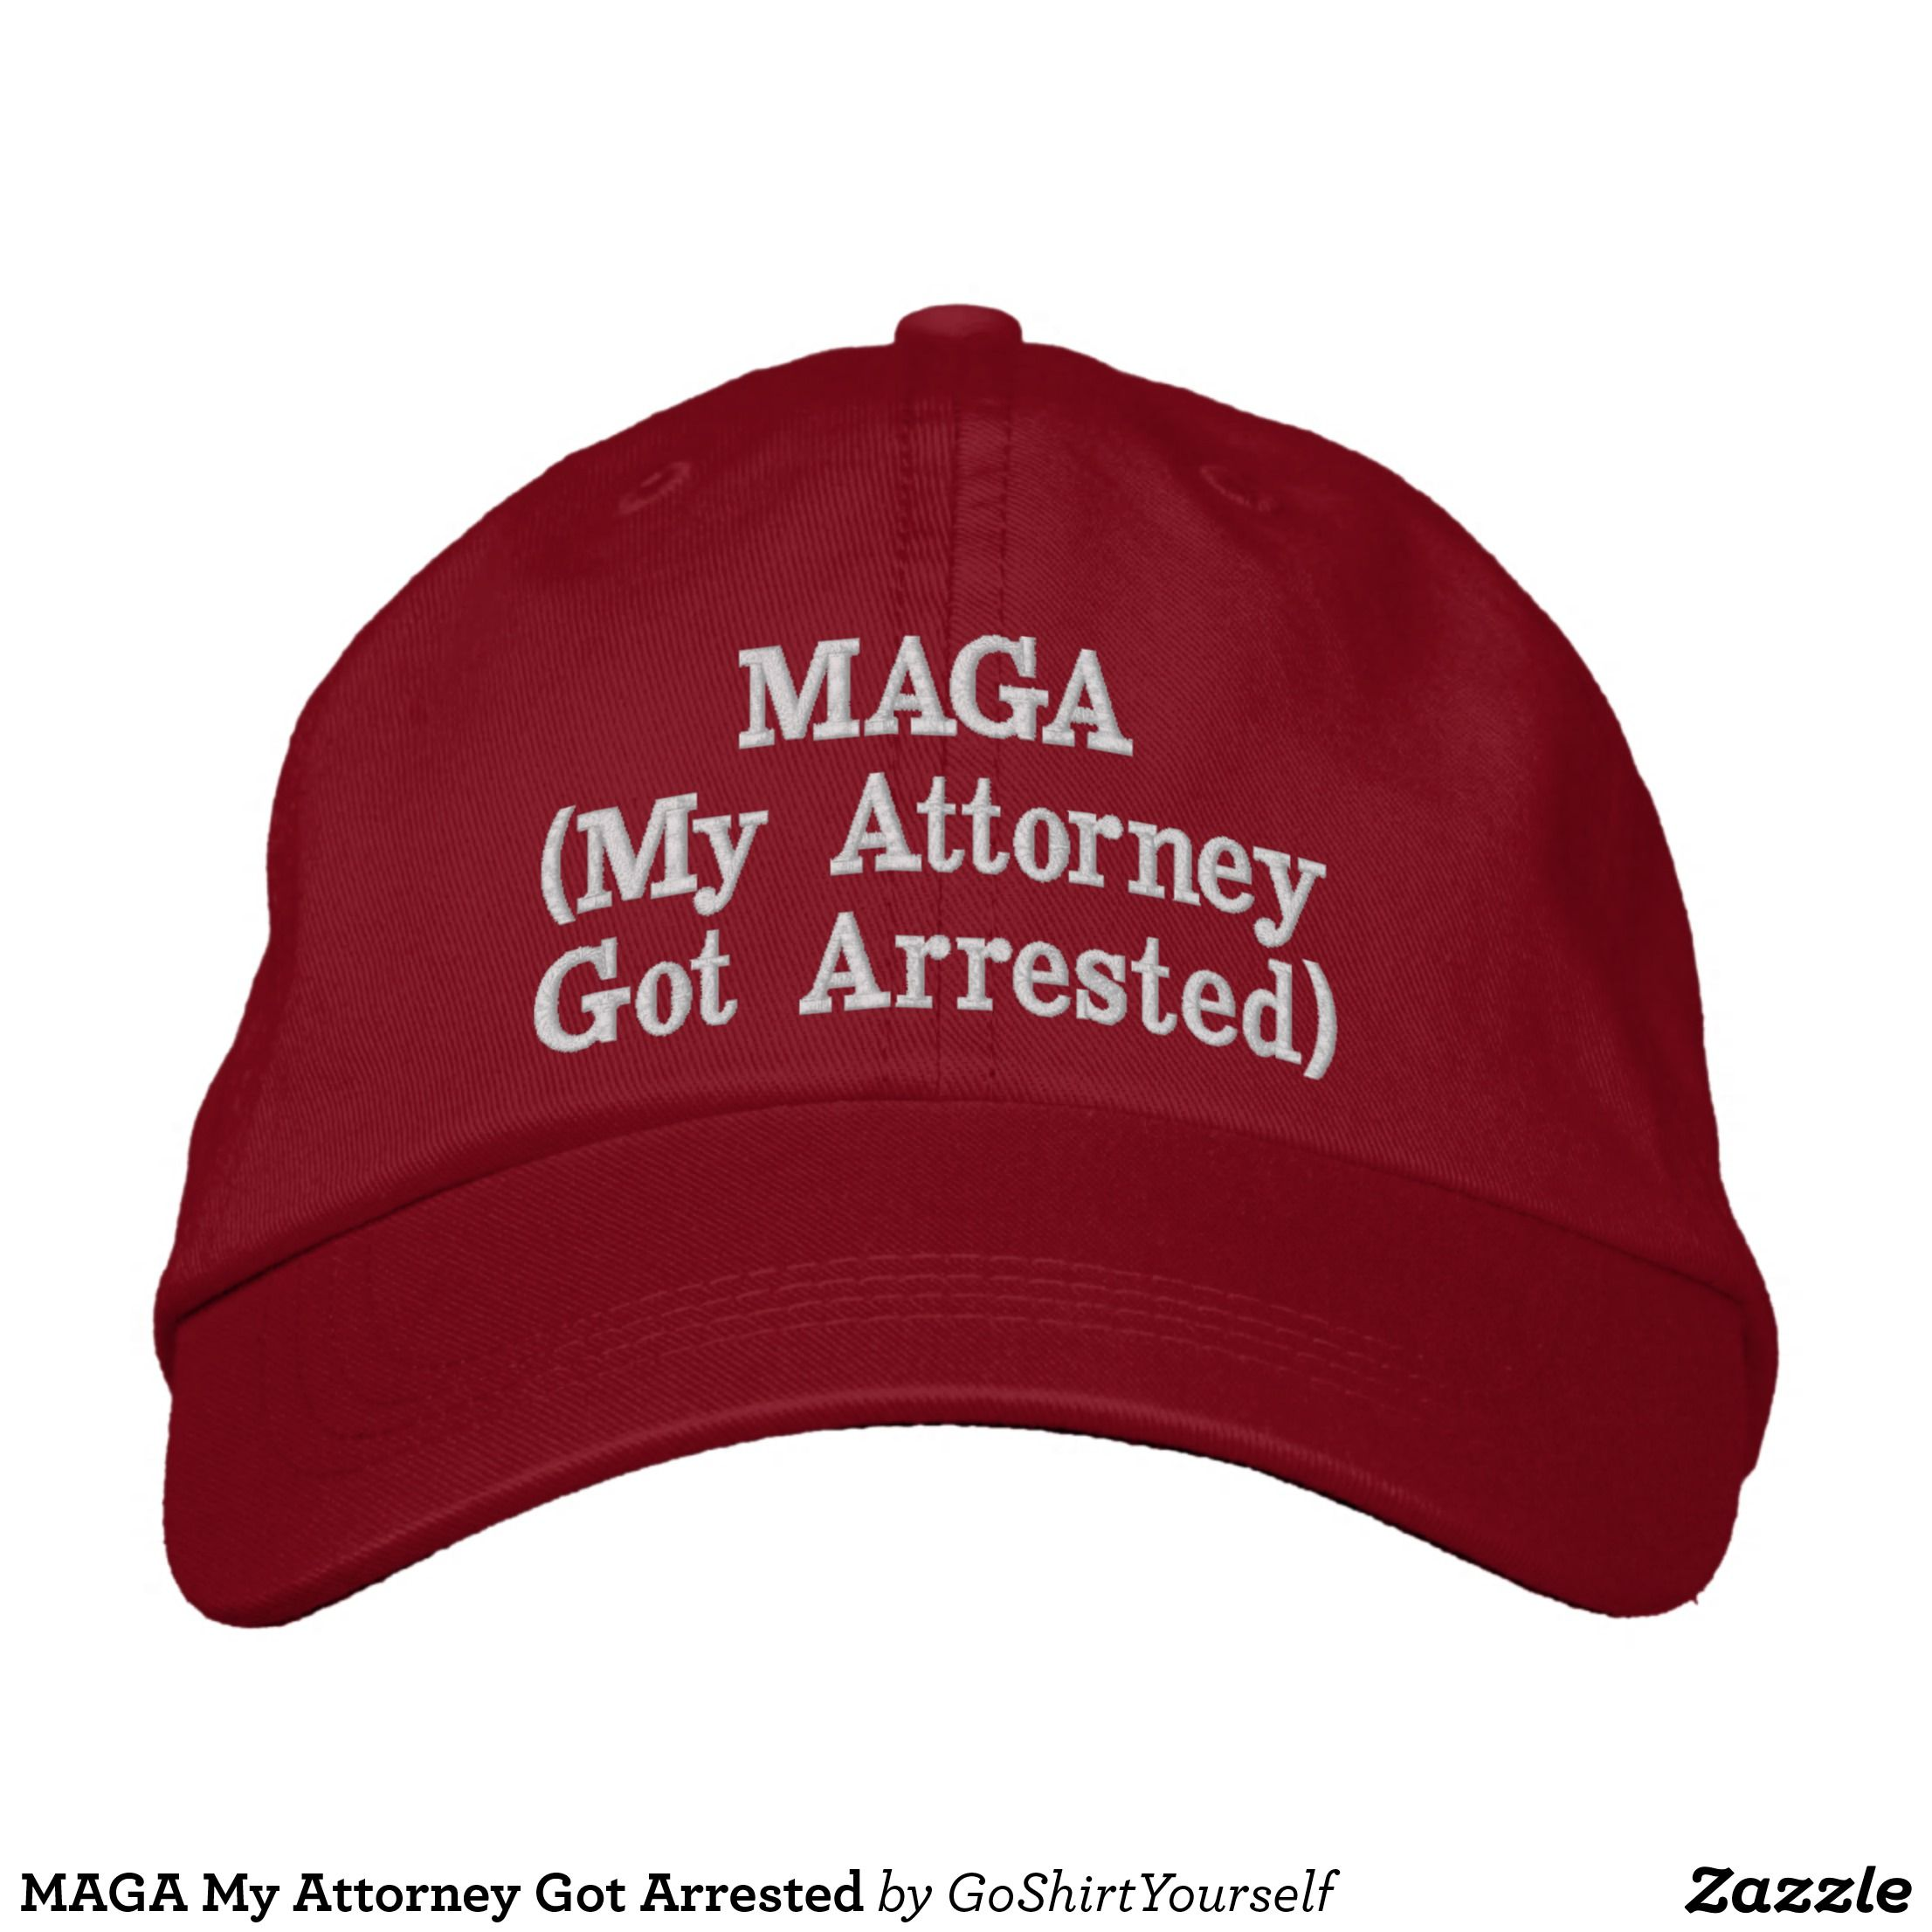 New Trump Hat Make America Great Again MAGA Baseball Cap Hat RED Olive Branch